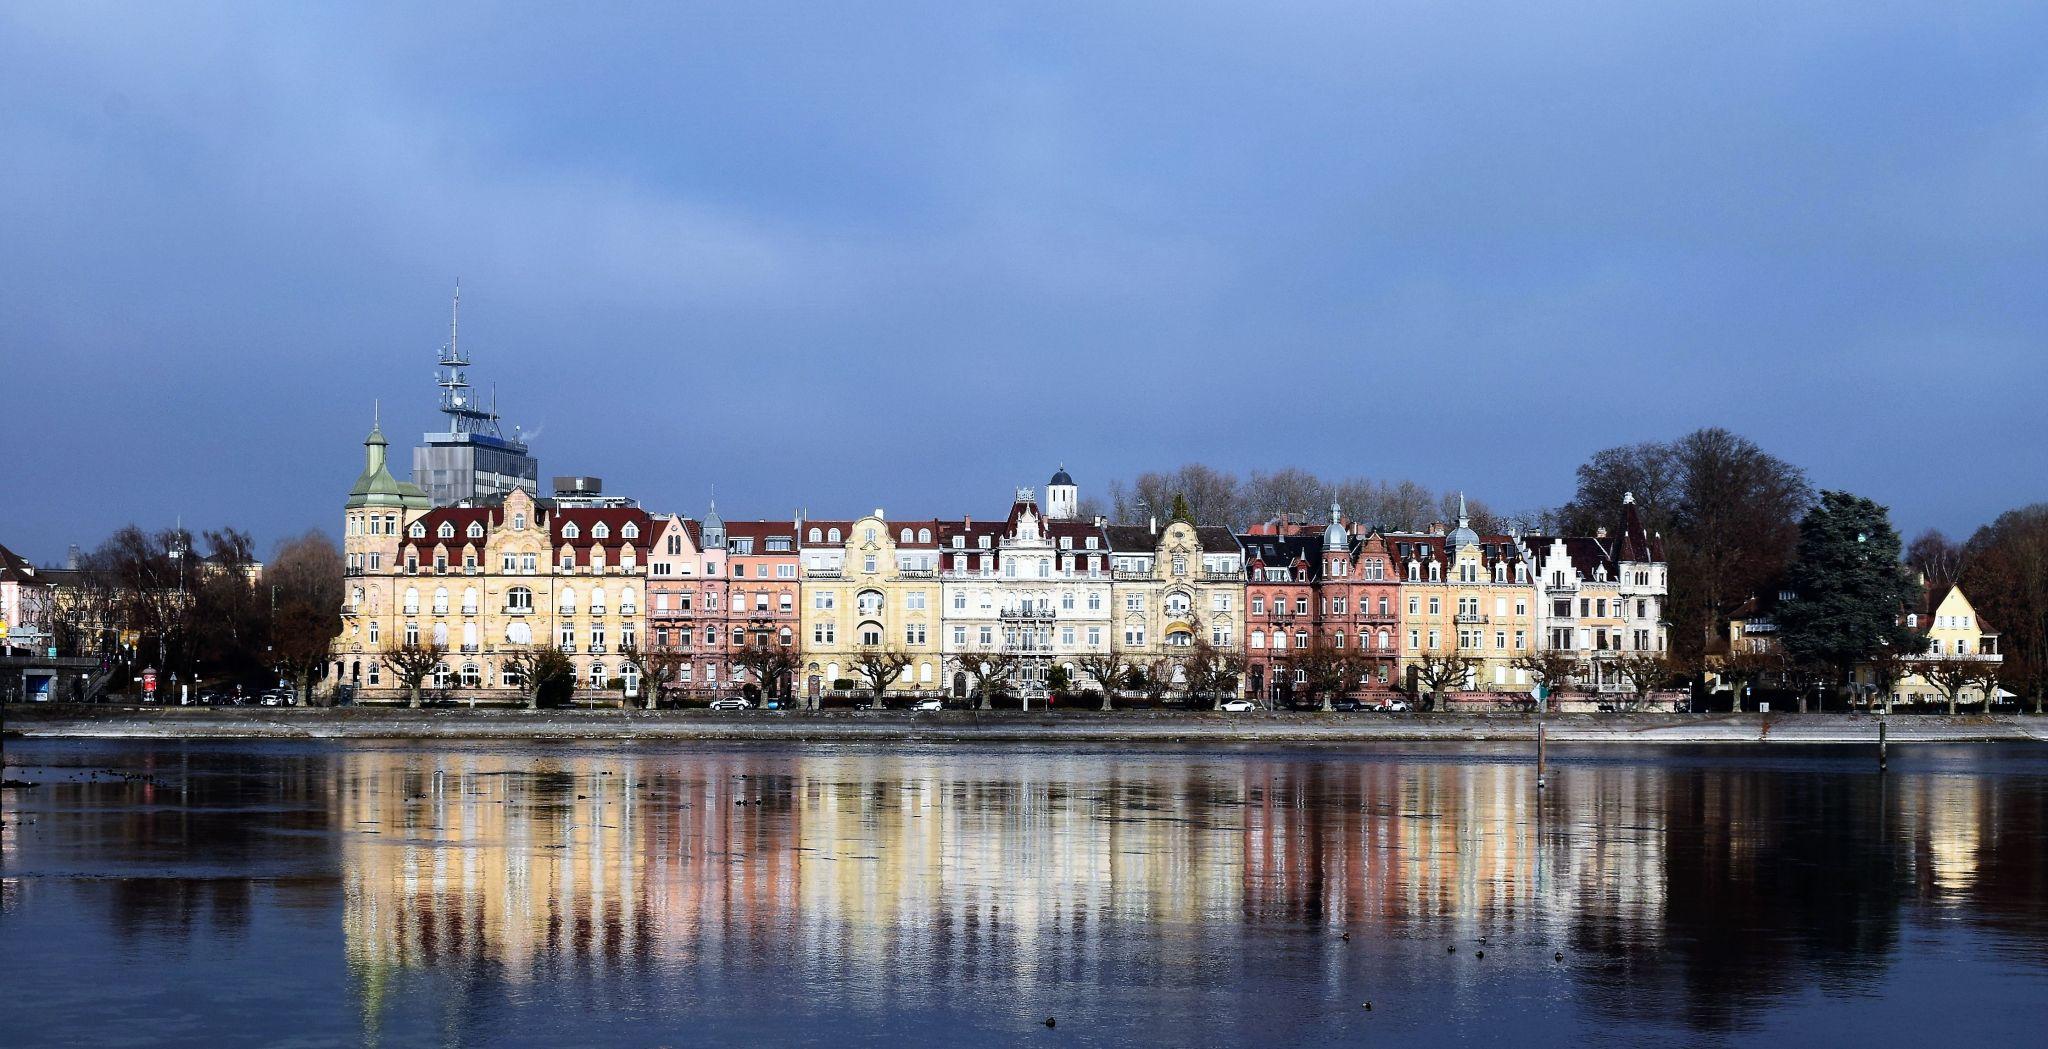 Konstanz, Bodensee, Germany, Germany